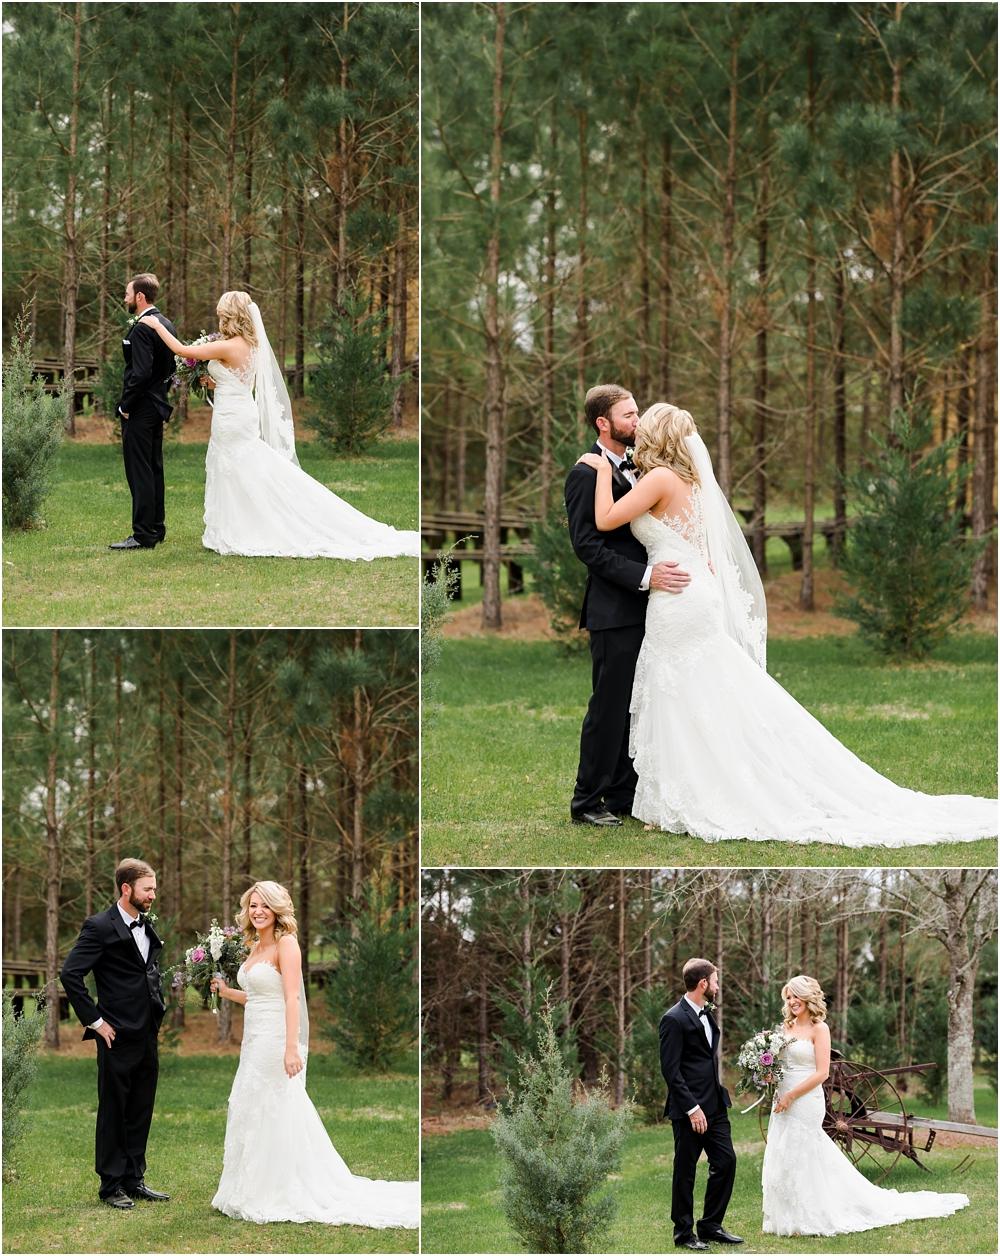 buchanan-florida-wedding-photographer-kiersten-grant (148 of 800).jpg